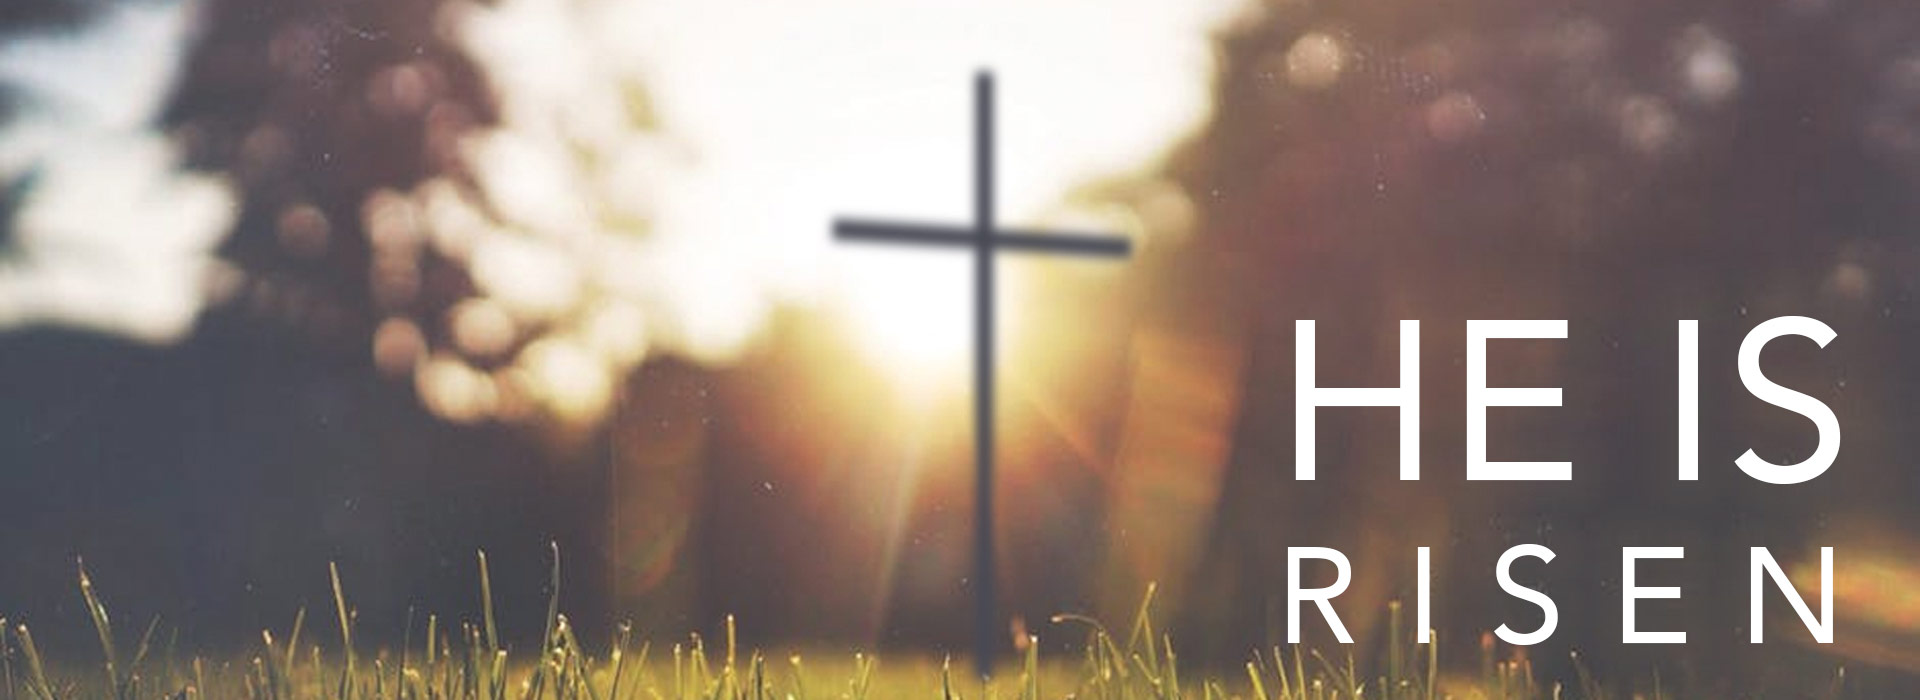 he-is-risen-header.jpg